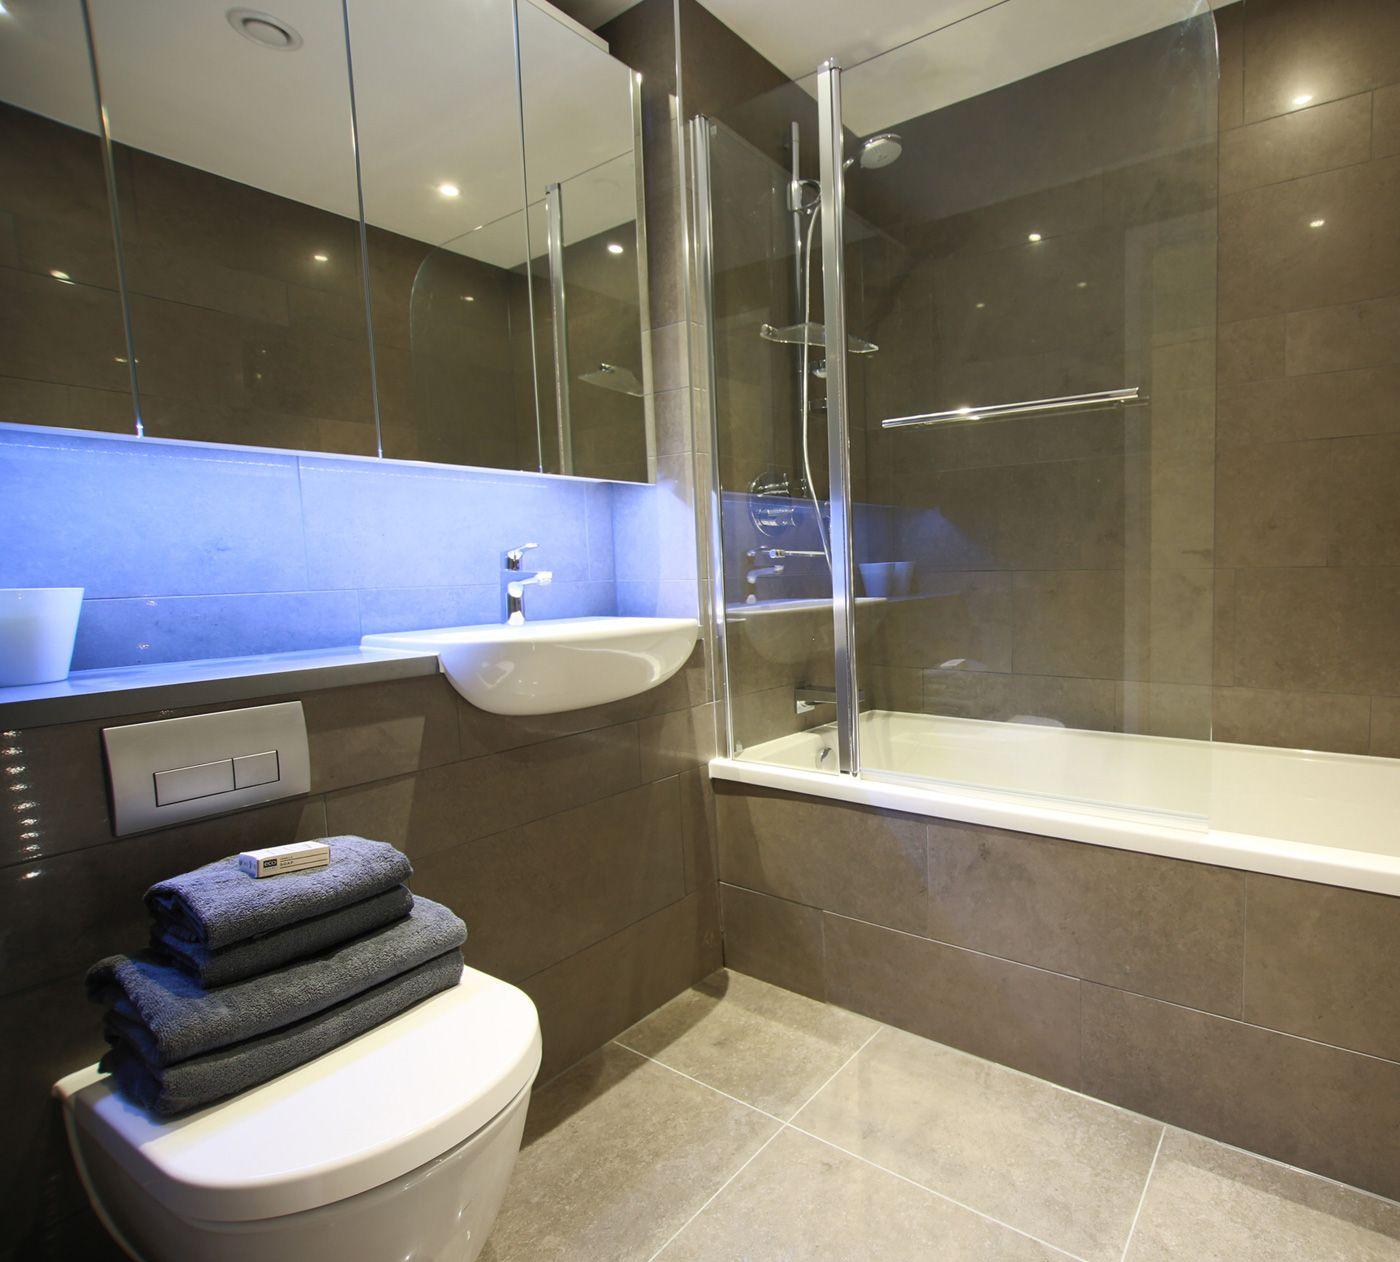 Two Bedroom Apartments London: REGENT APARTMENTS: LUXURY 1, 2, 3 & 4 BEDROOM APARTMENTS